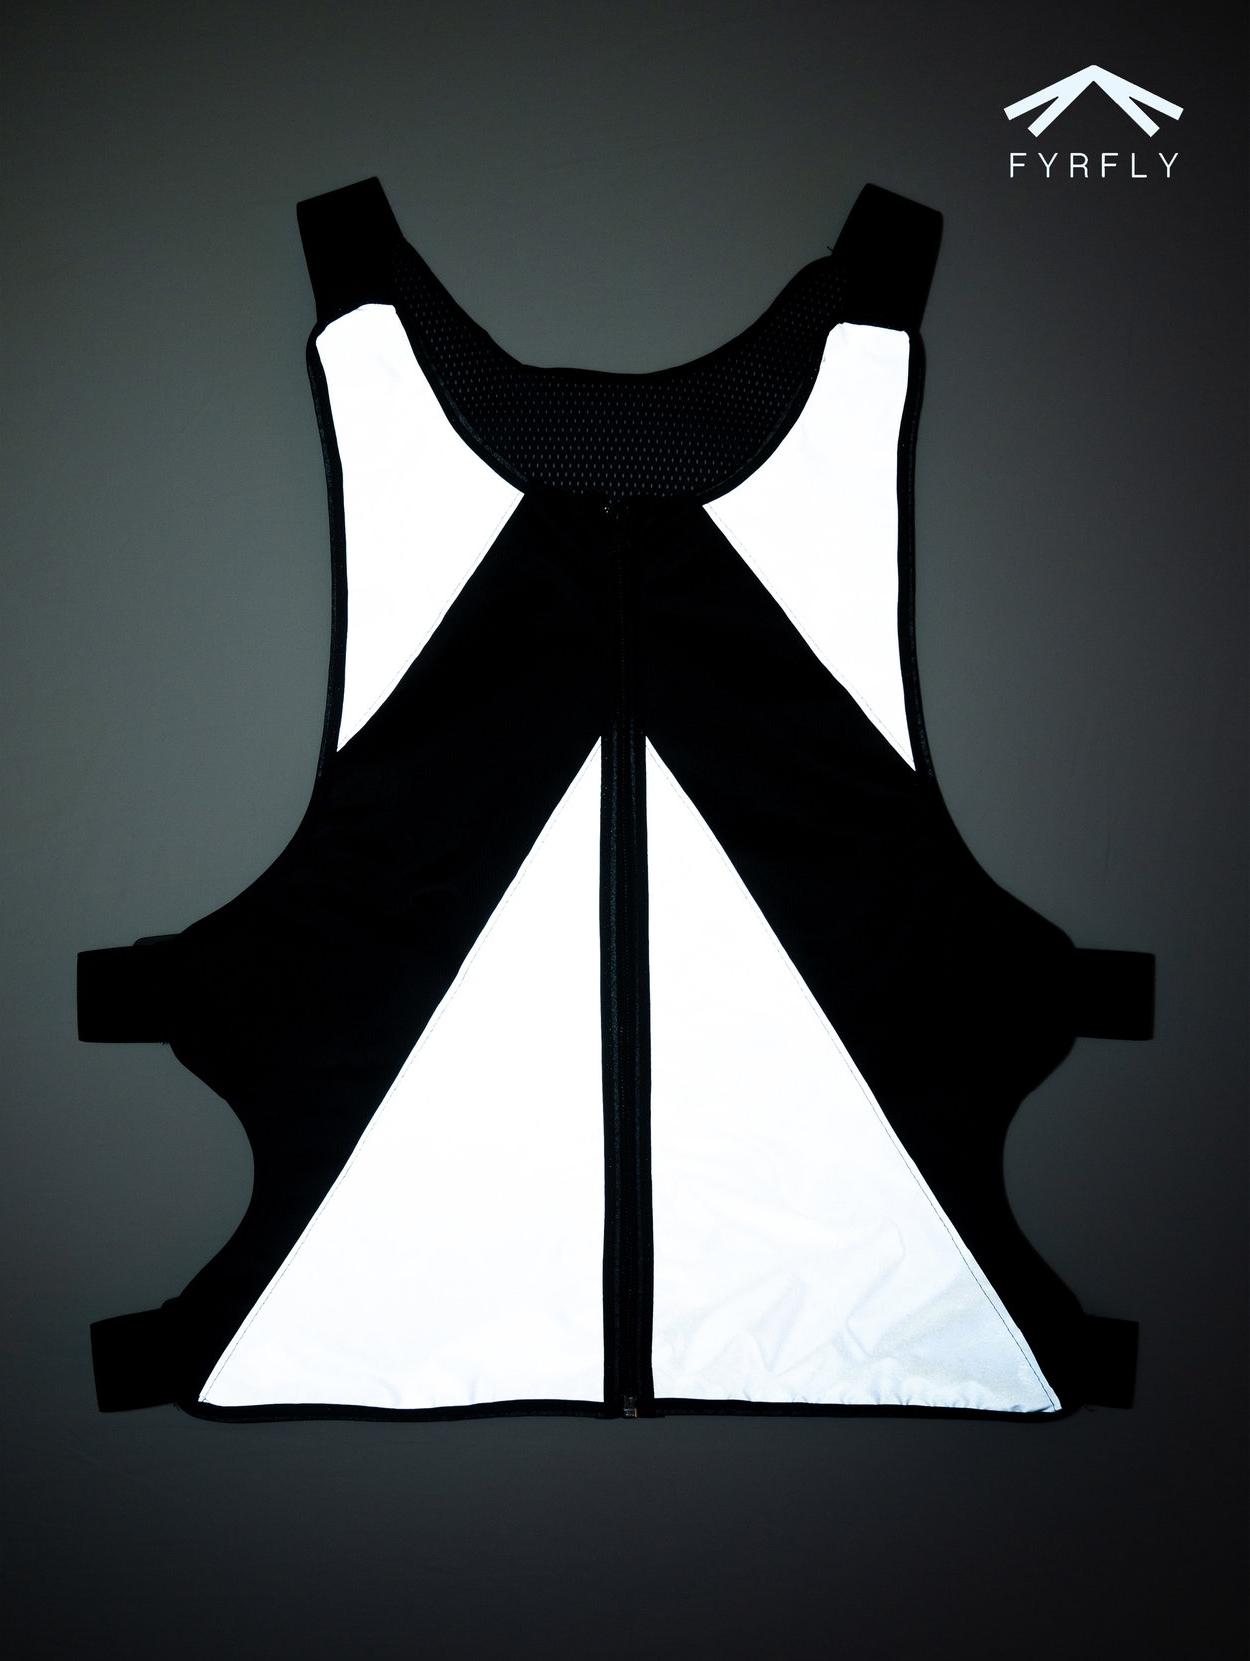 FYRFLY Vest Front Day Night.jpg